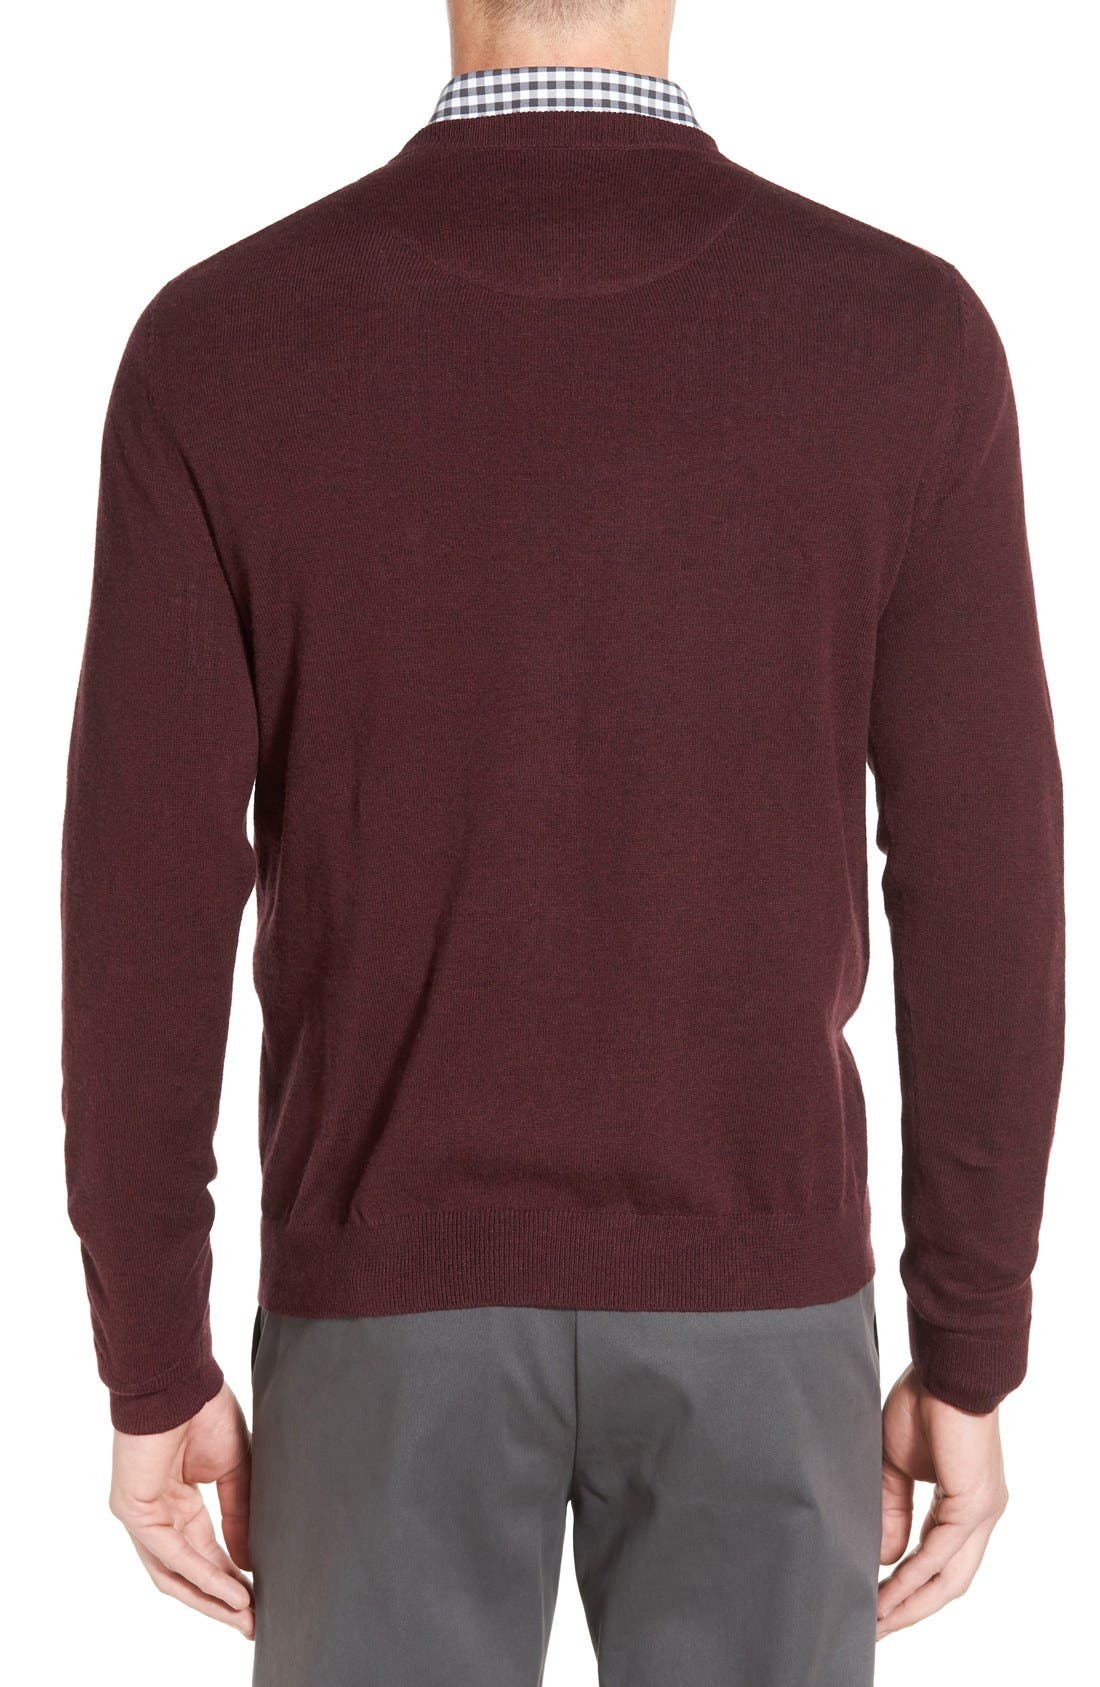 Alternate Image 2  - Nordstrom Men's Shop Cotton & Cashmere Crewneck Sweater (Regular & Tall)